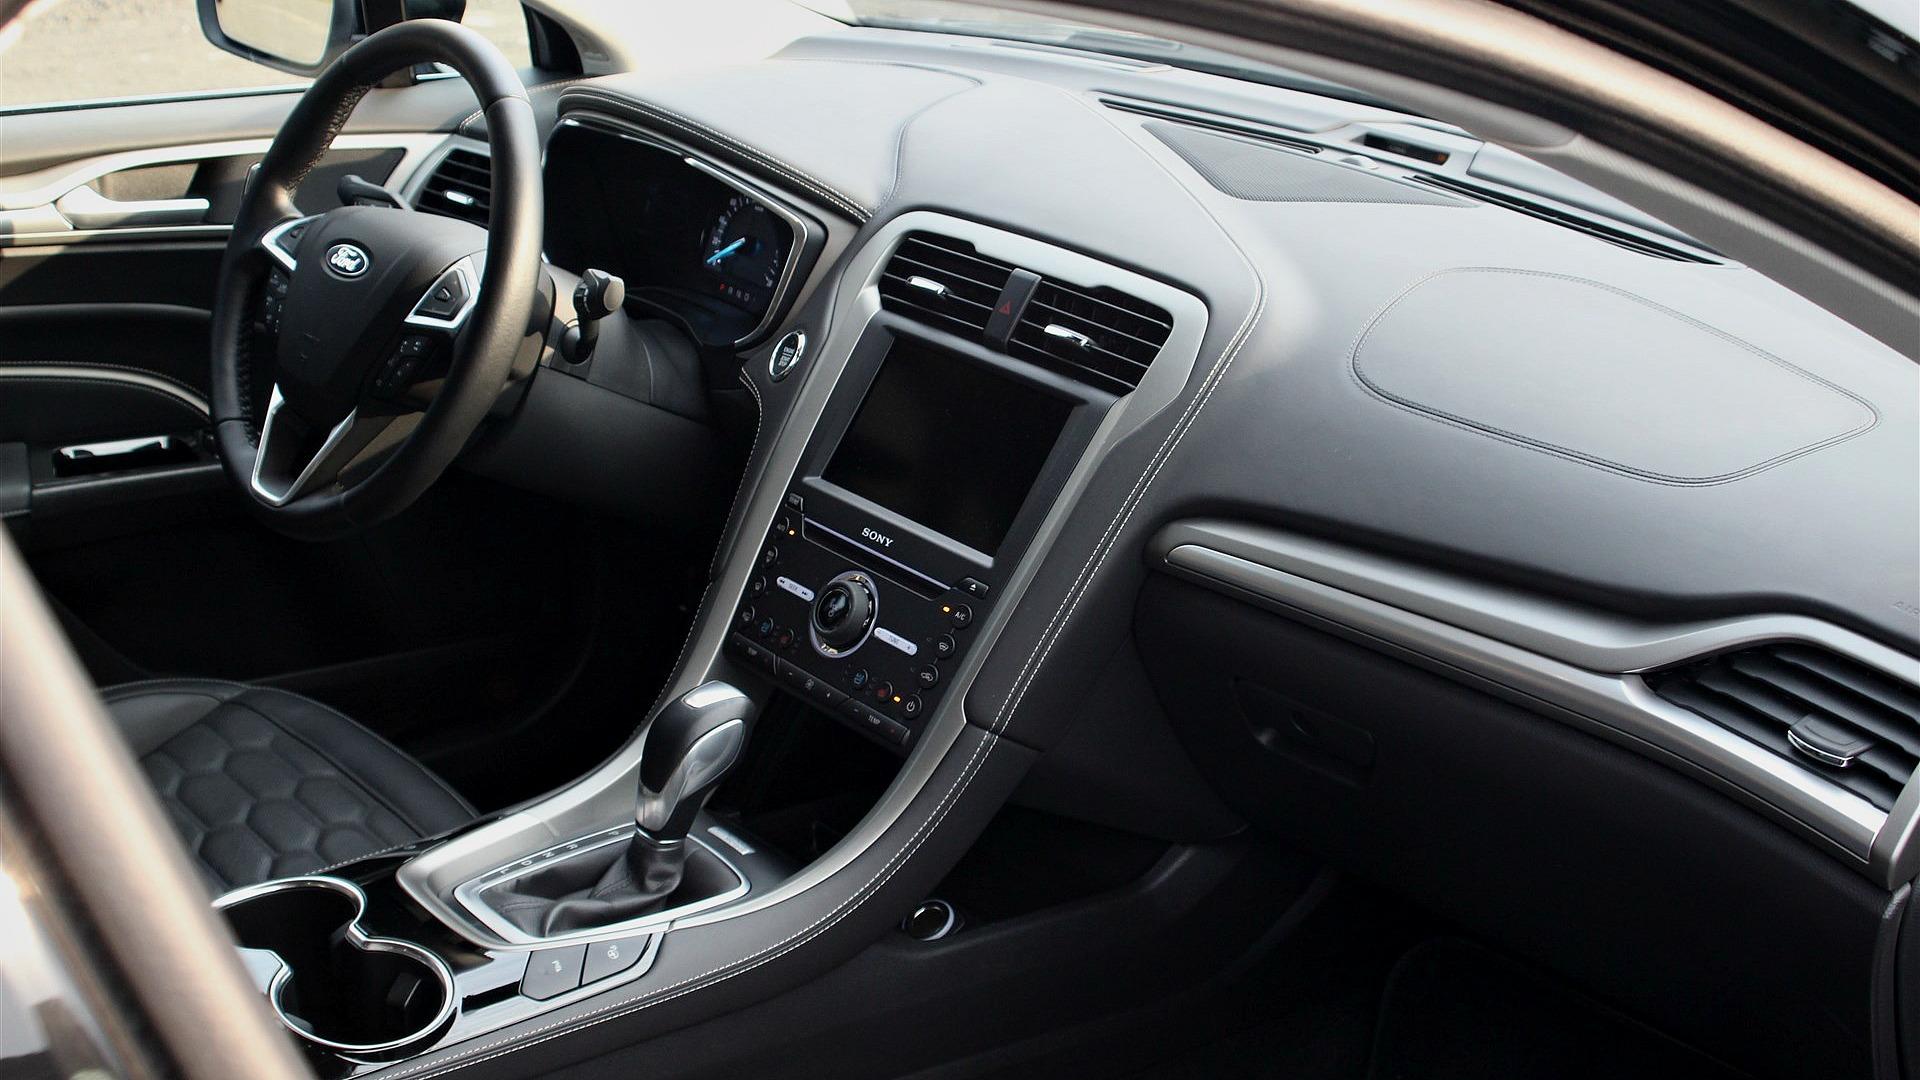 Ford Mondeo Vignale Hybrid Interior (5)